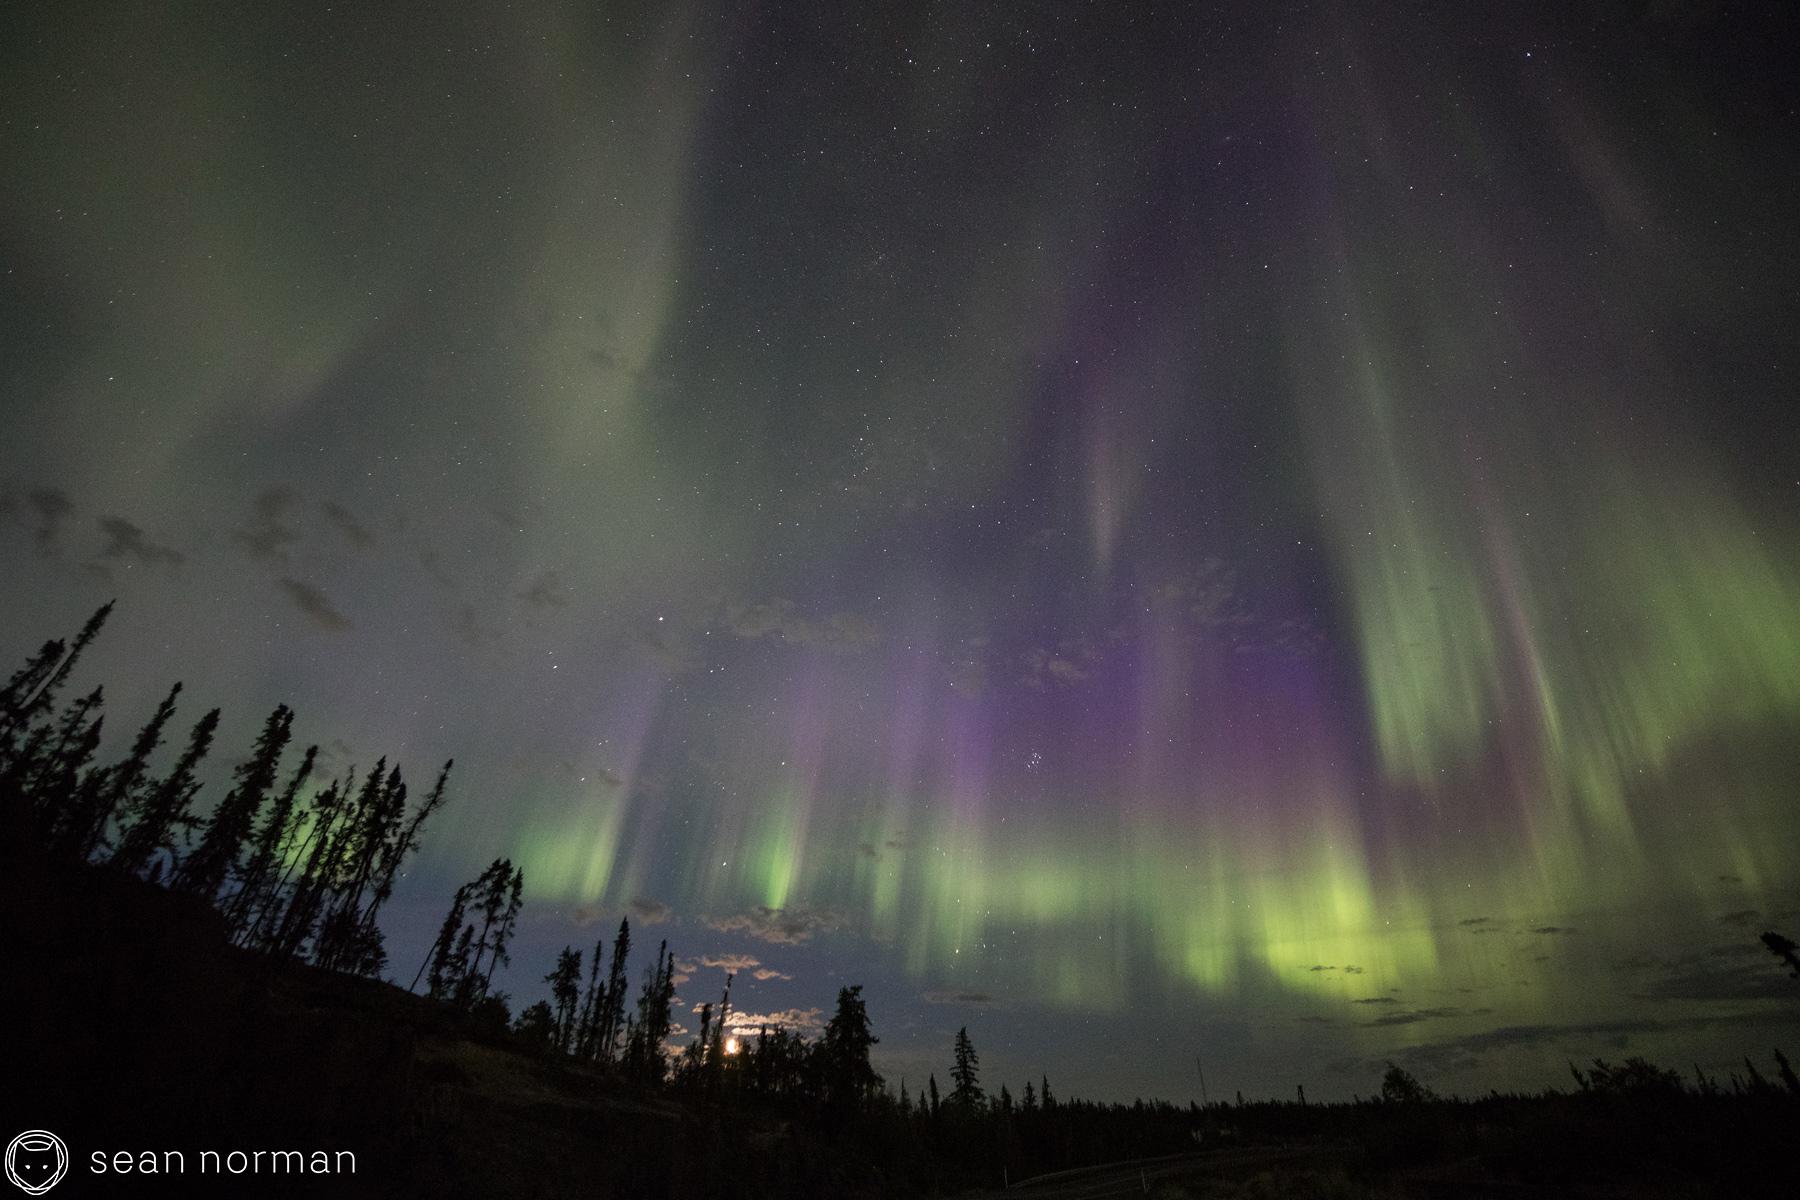 Autumn Auora Viewing in Yellowknife - Sean Norman Aurora Chaser - 9.jpg